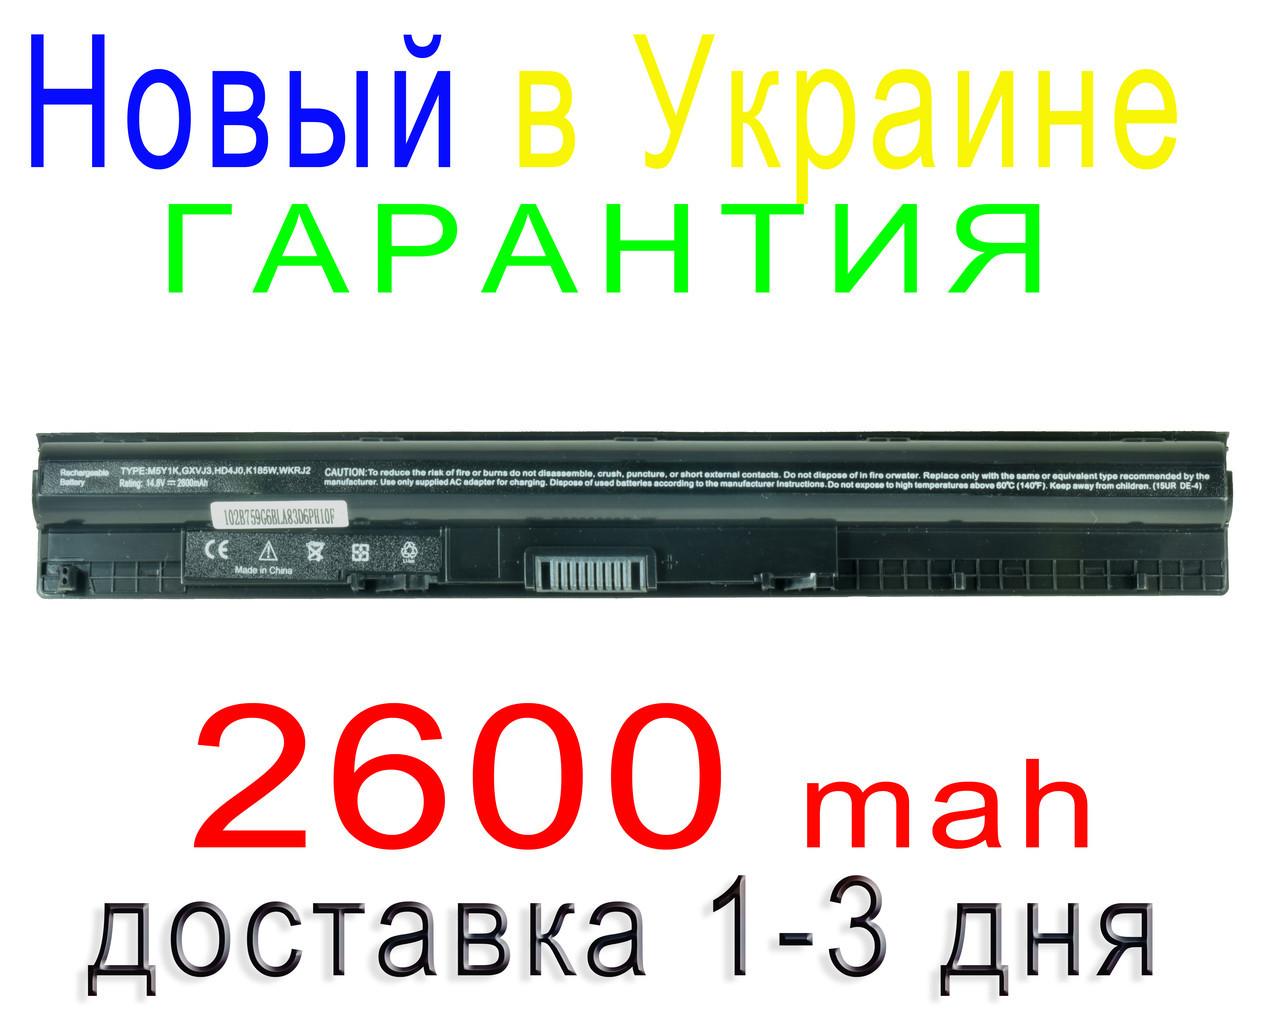 Аккумулятор батарея DELL Inspiron 15-5552 5552 N5552 15-5559 5559 N5559 15-3552 3552 N3552